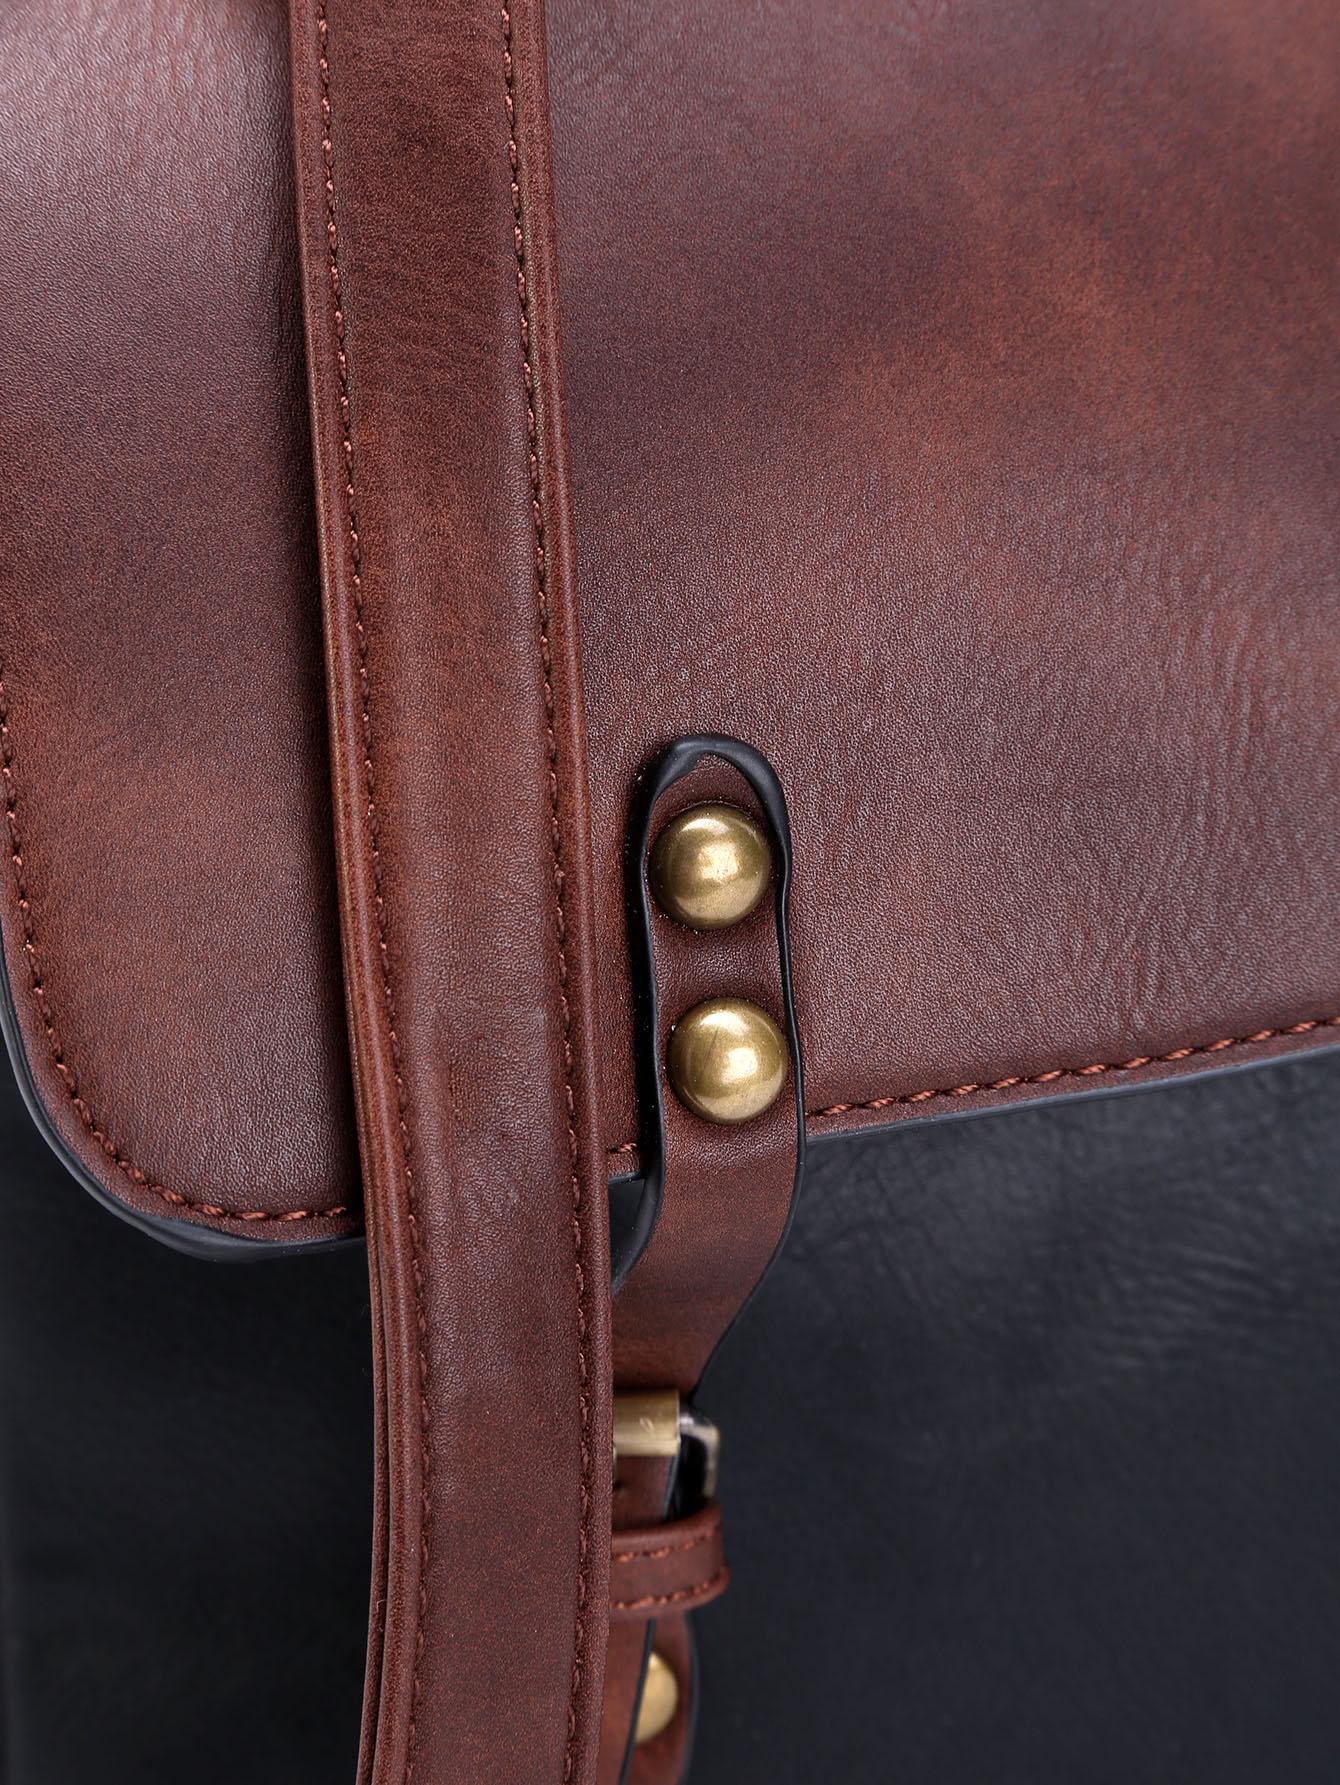 bag160920916_2